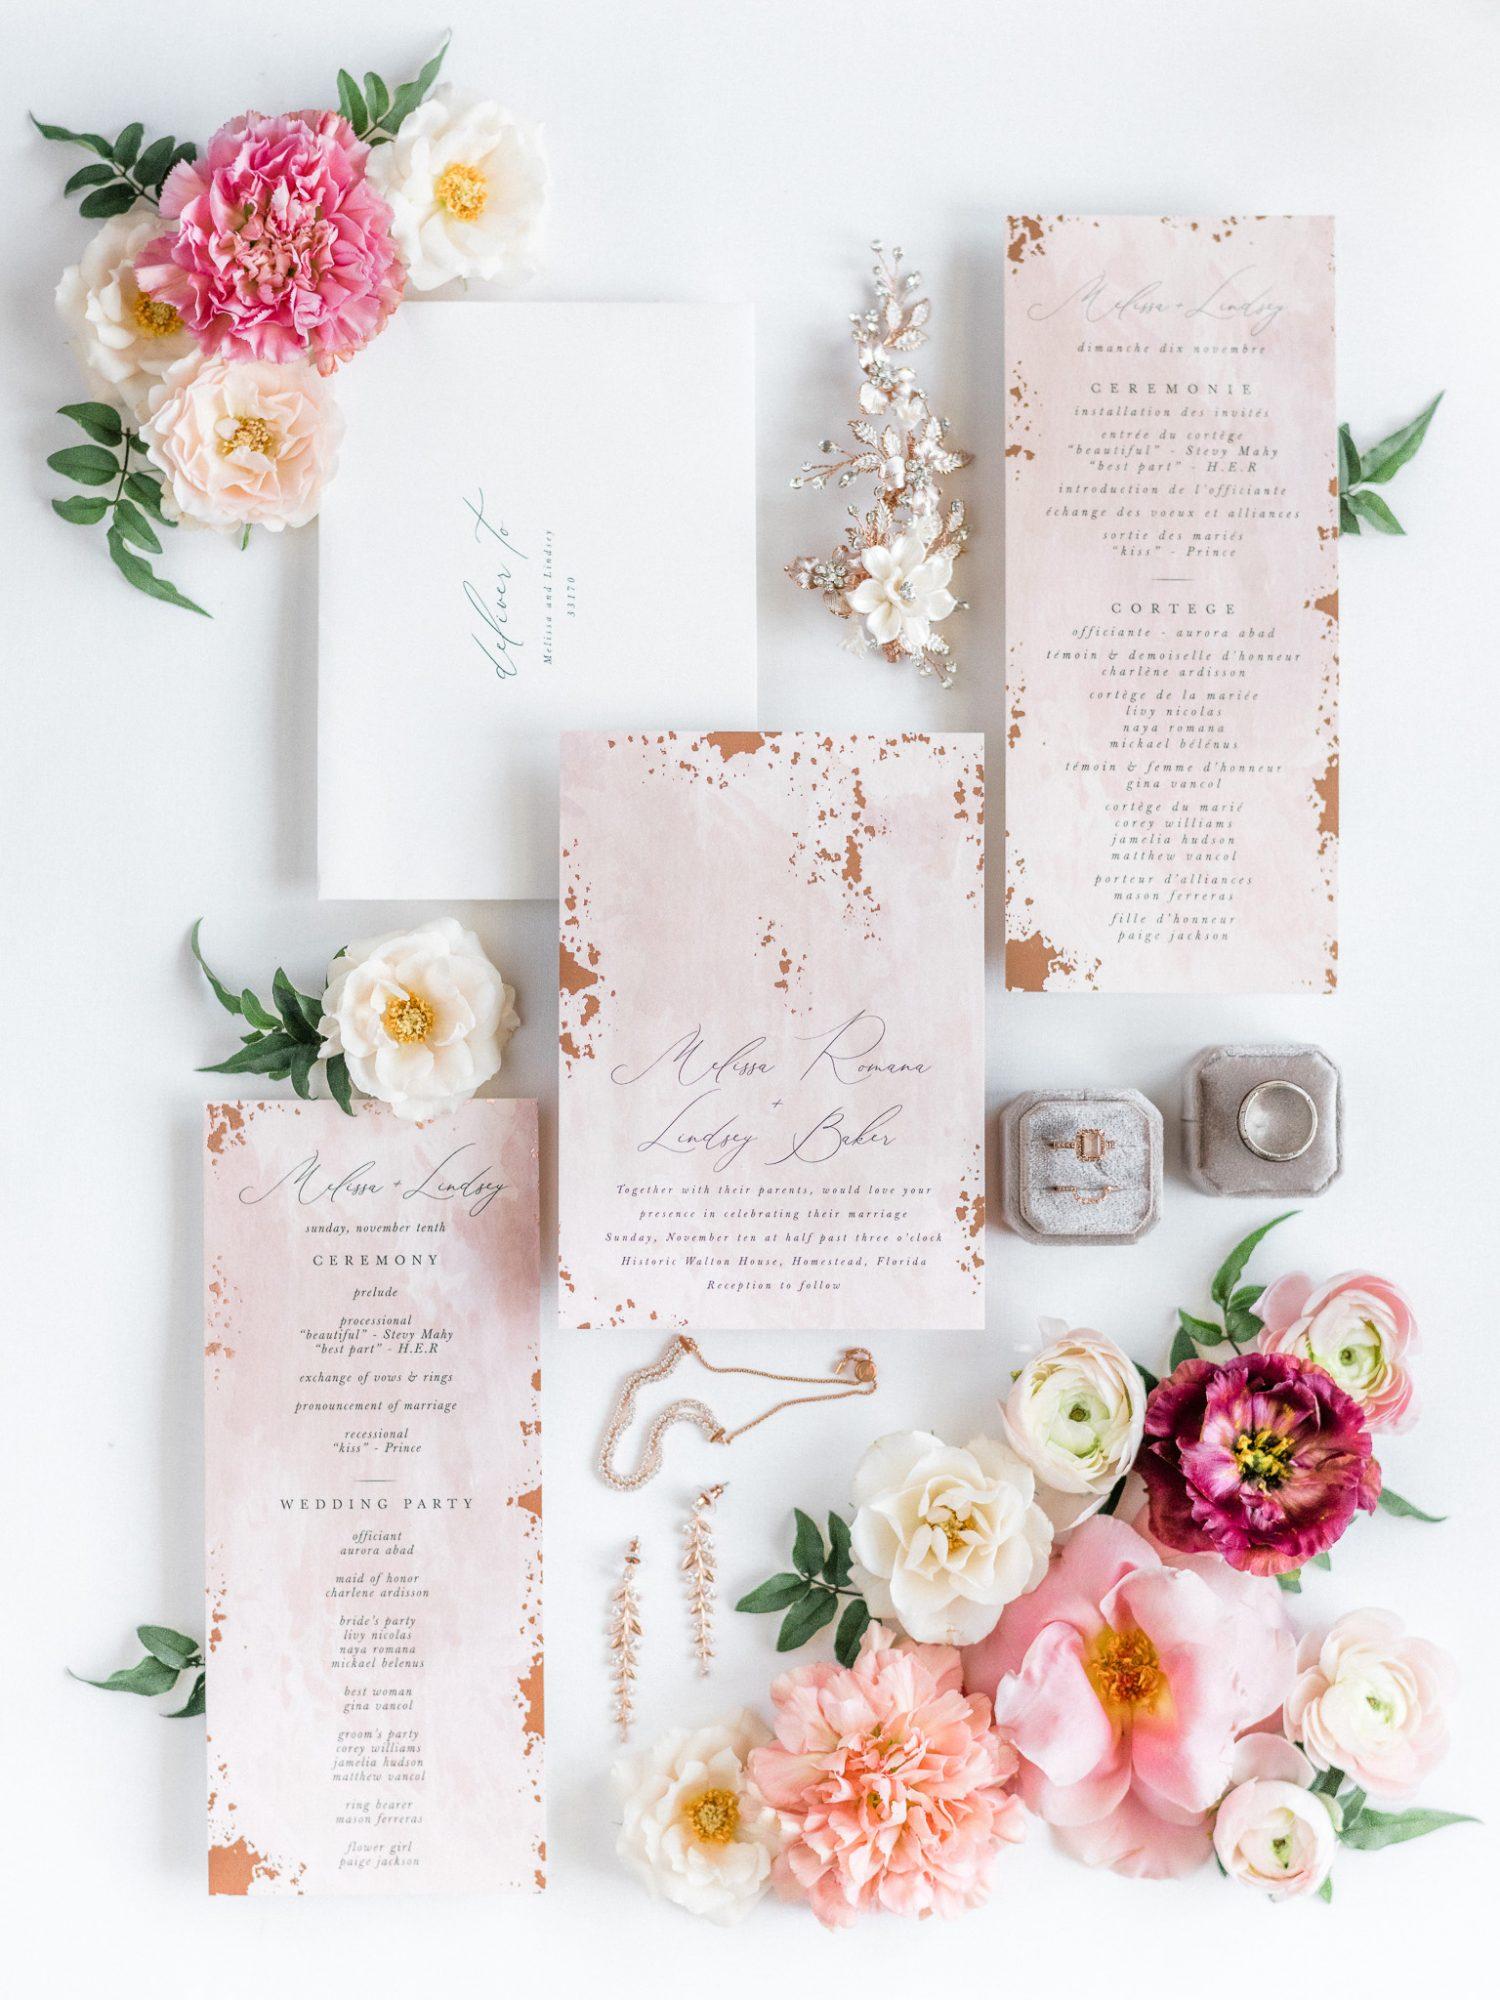 melissa lindsey wedding invitation suite with flowers